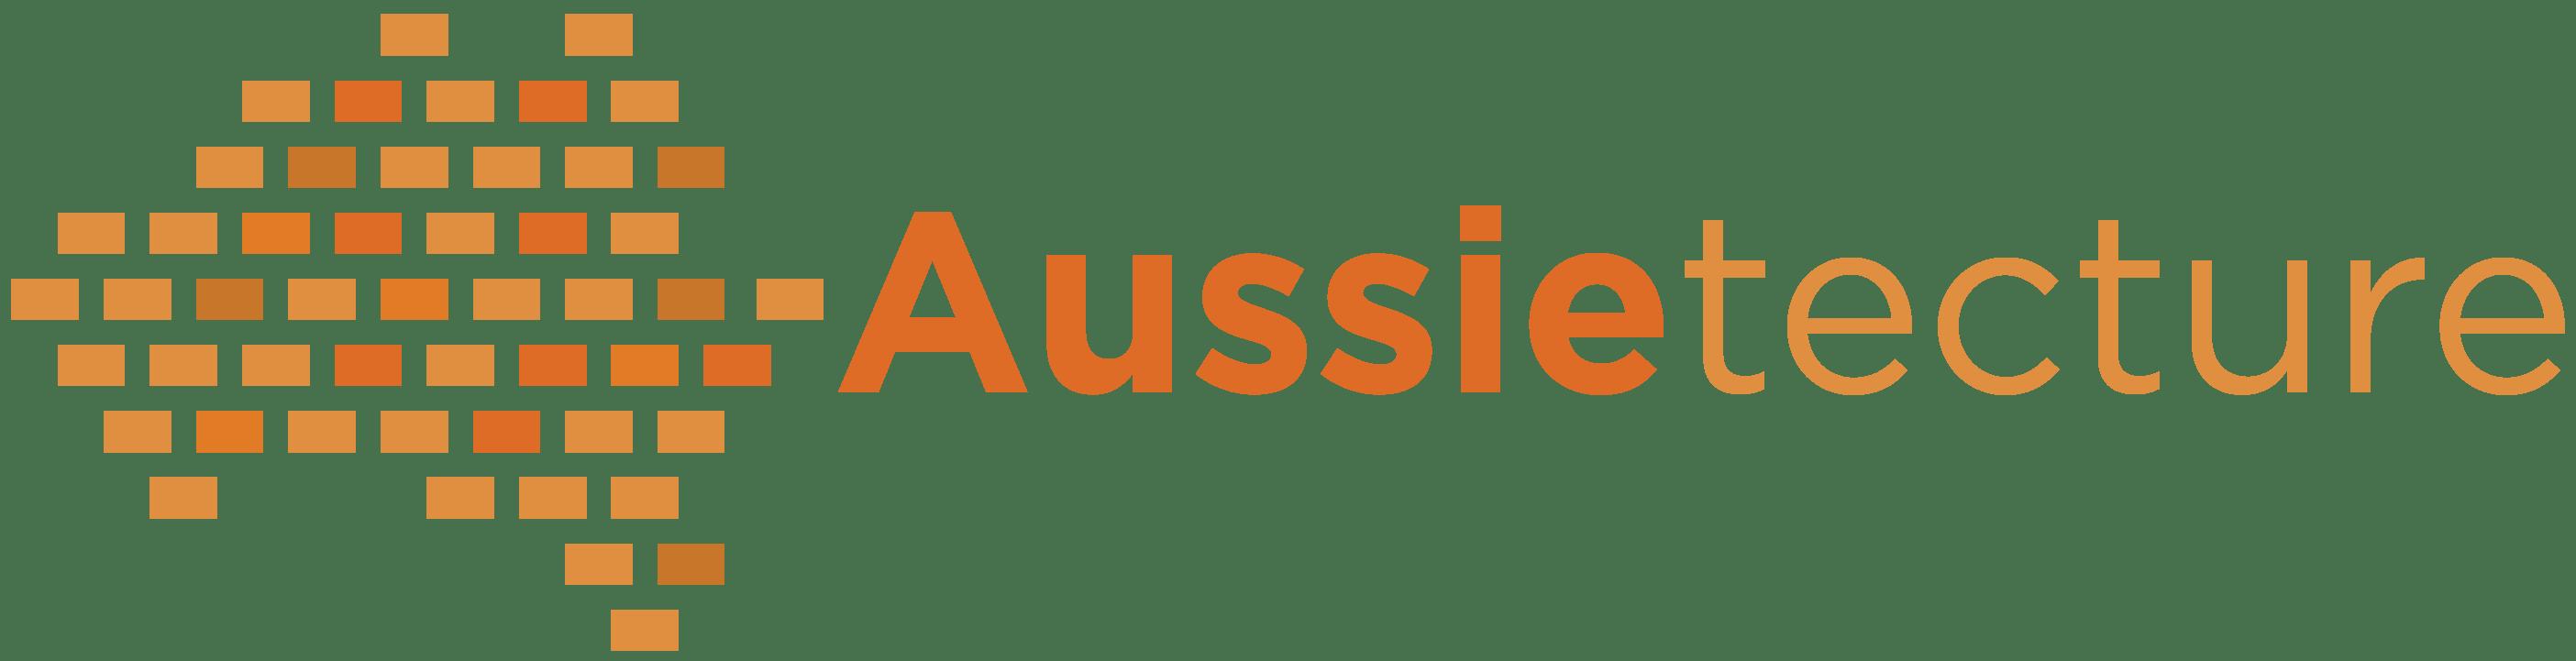 Aussietecture